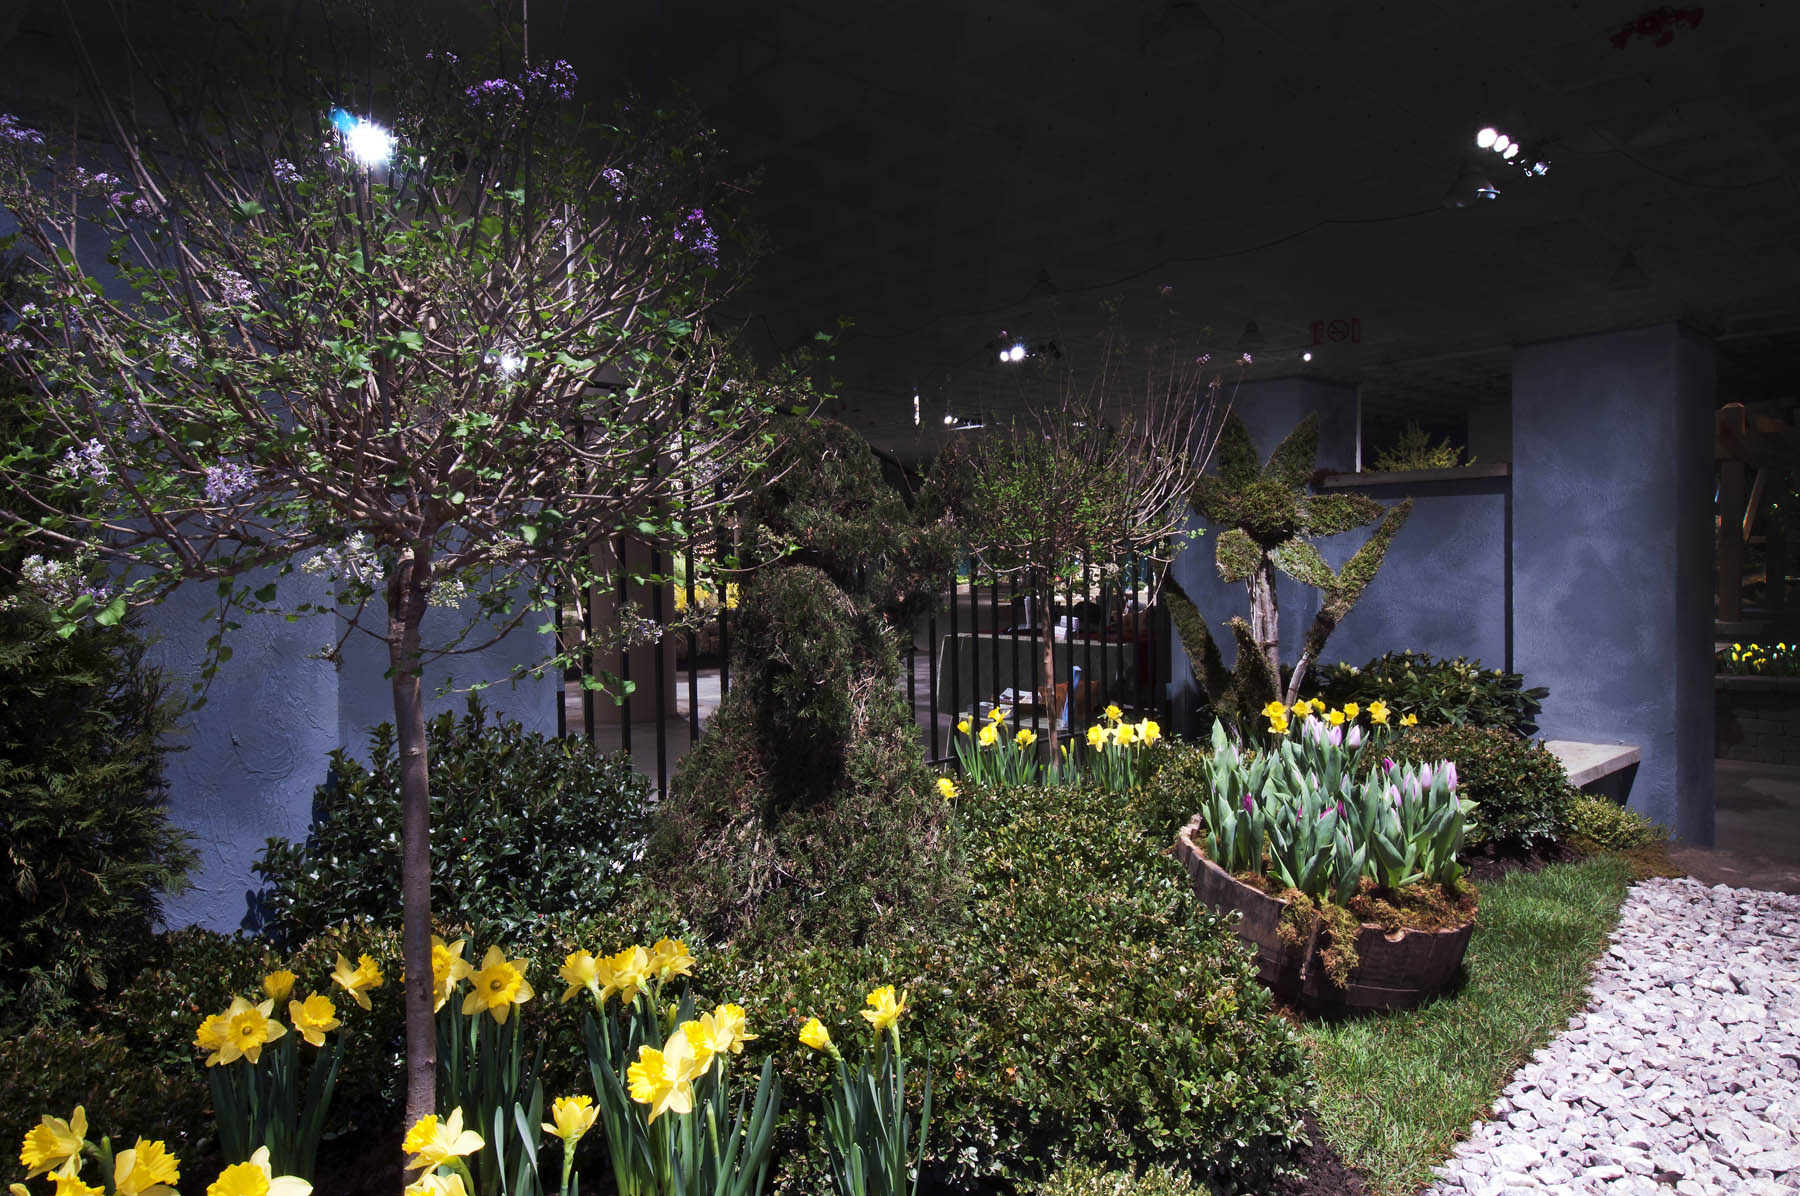 Edward scissorhands garden garden inspiration Cleveland home and garden show 2017